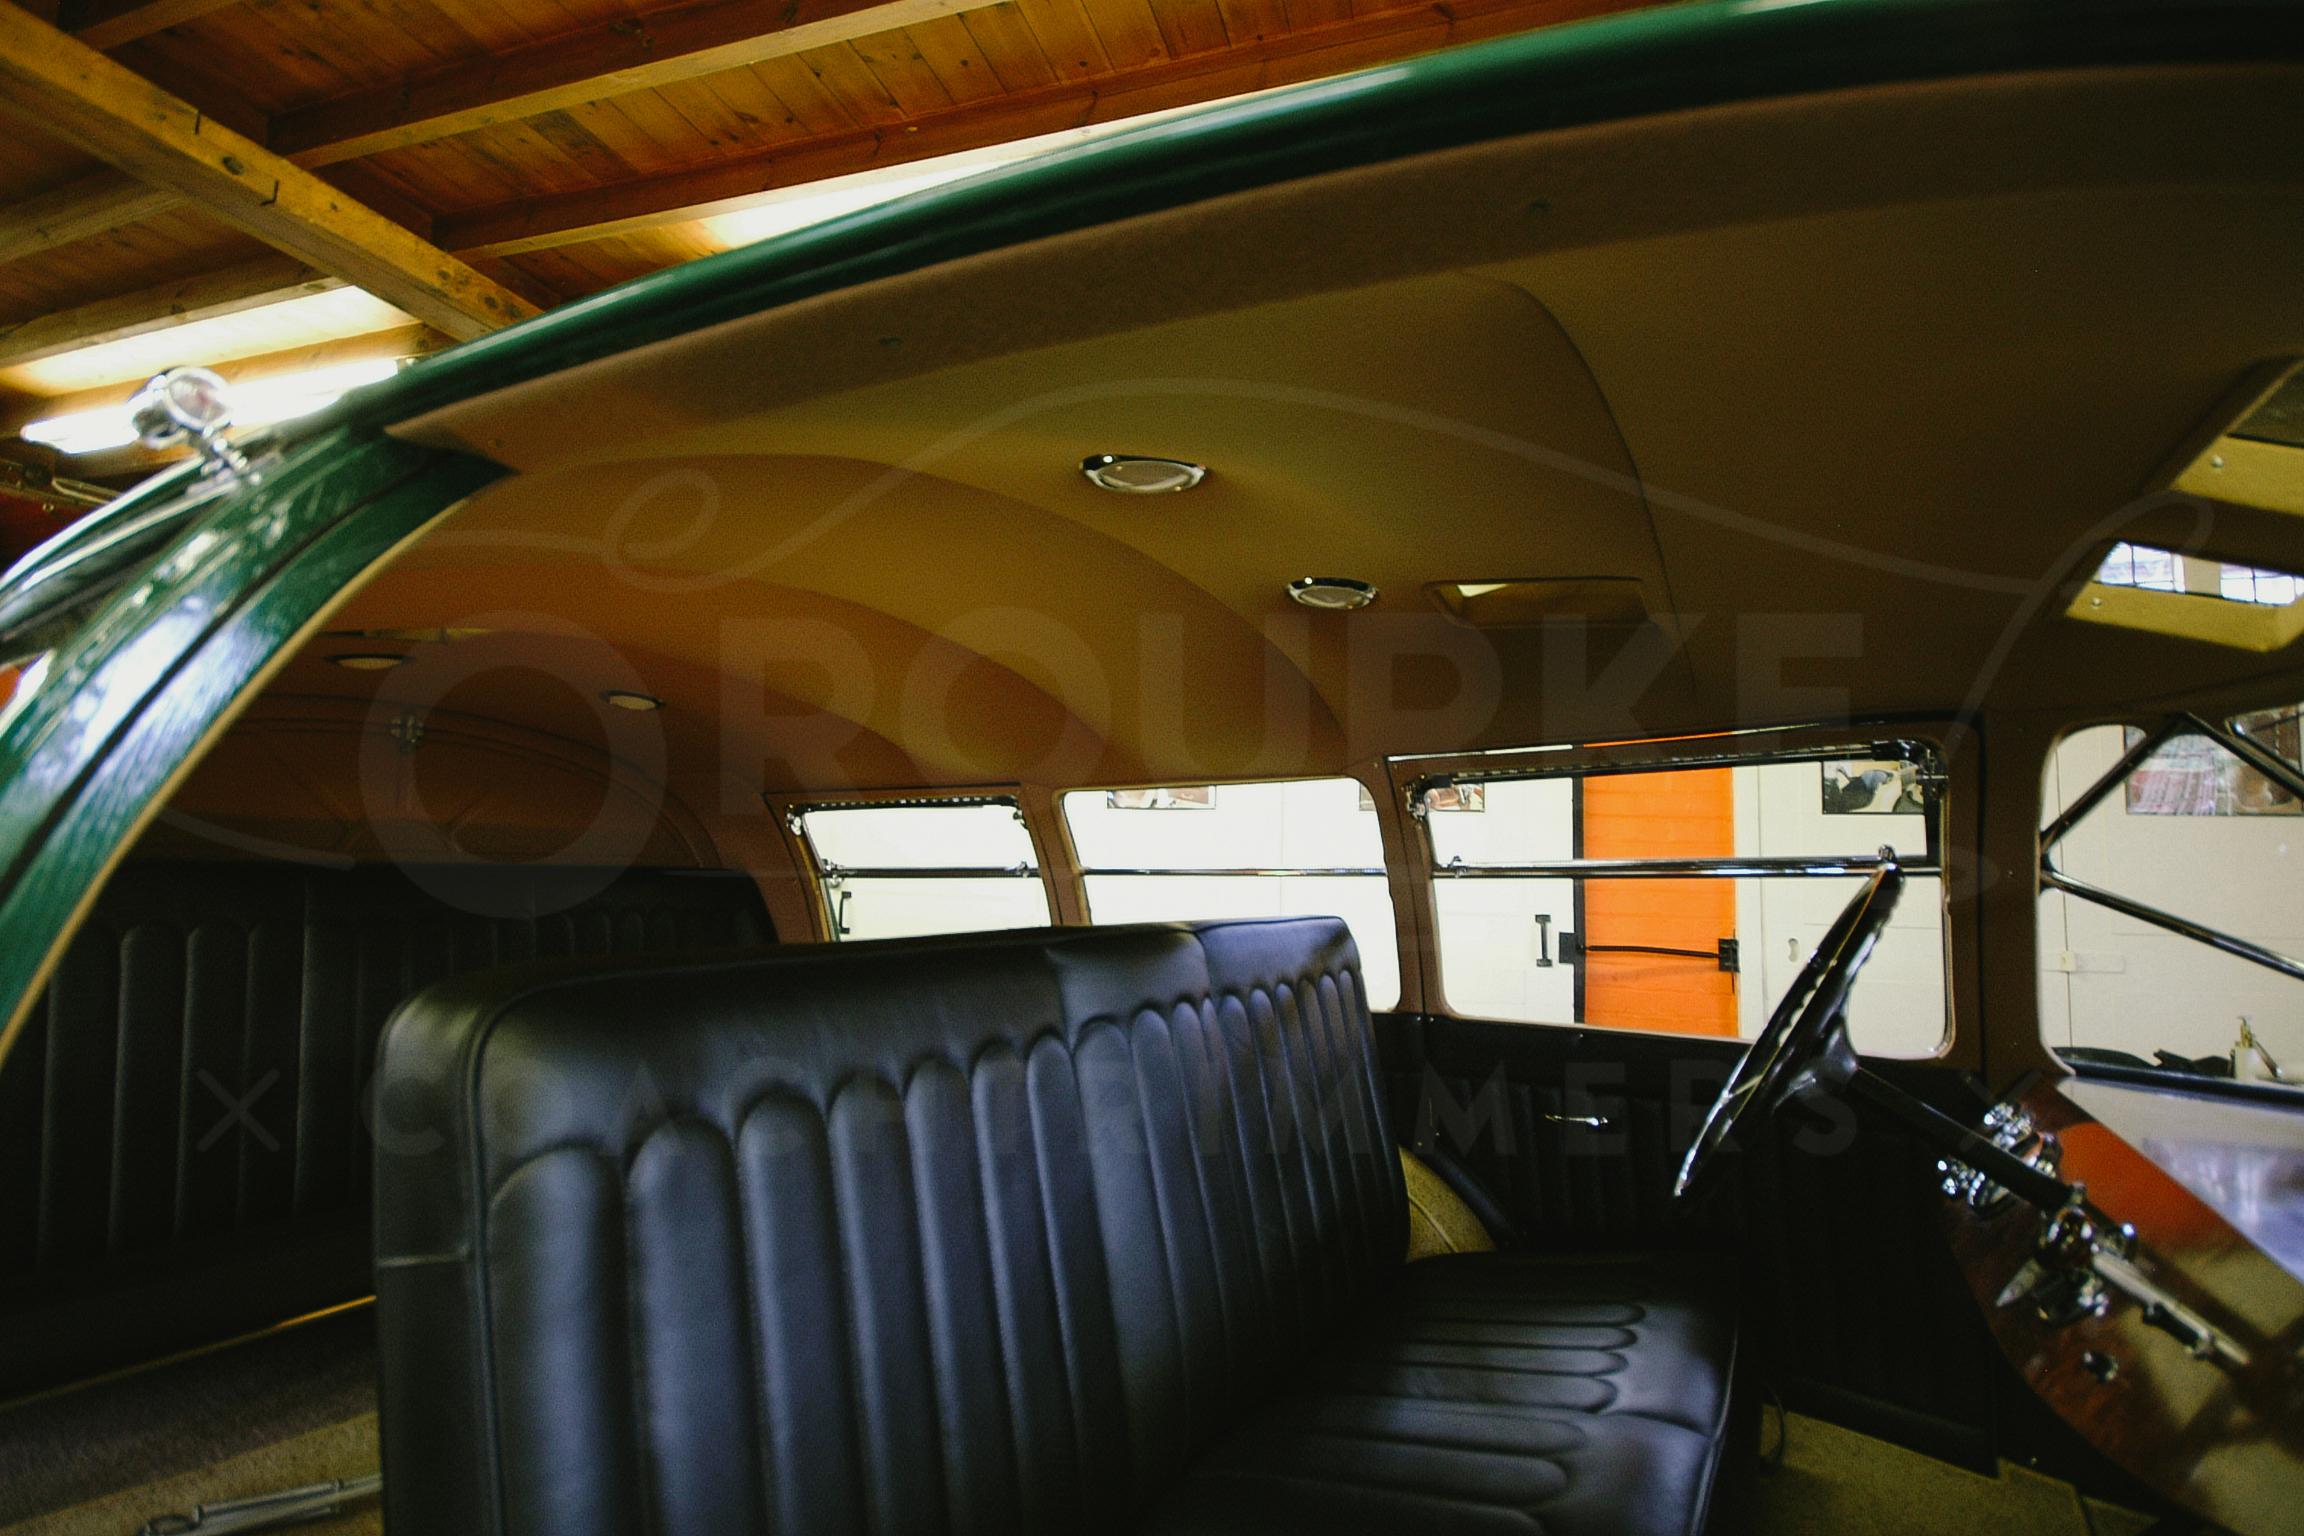 o-rourke-coachtrimmers-dymaxion-car-3-10.jpg